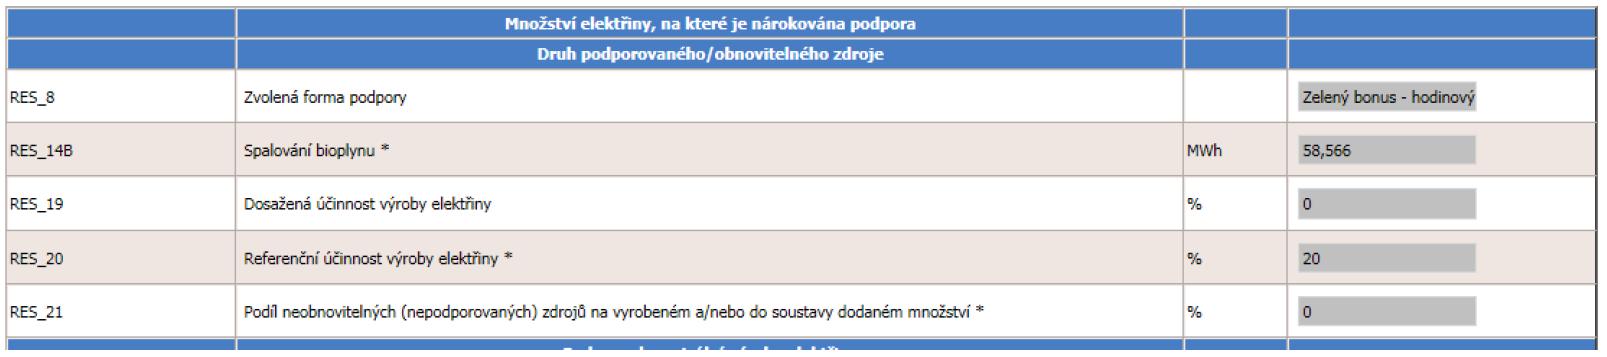 13_vyplnovani_vykazu_obnovitelne_zdroje_spalovani_bioplynu.png